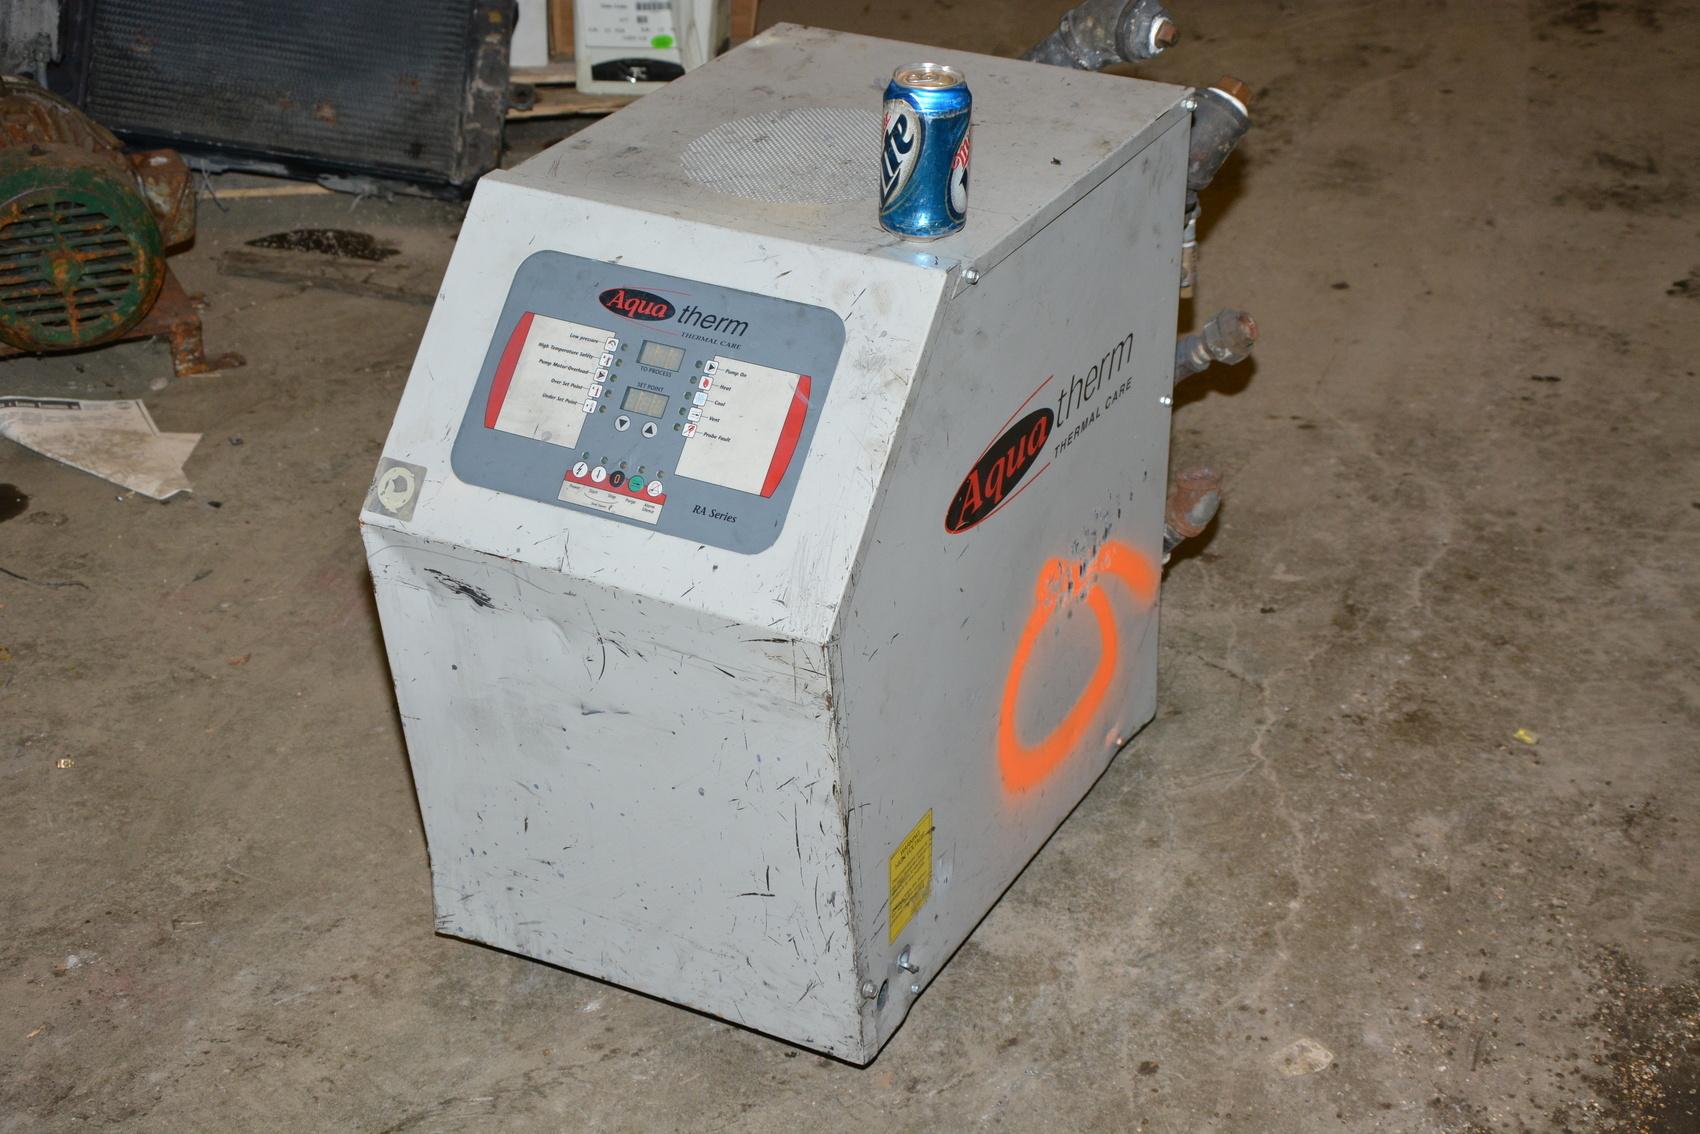 Thermal Care Aquatherm Ser RA Water Temperature Control Unit